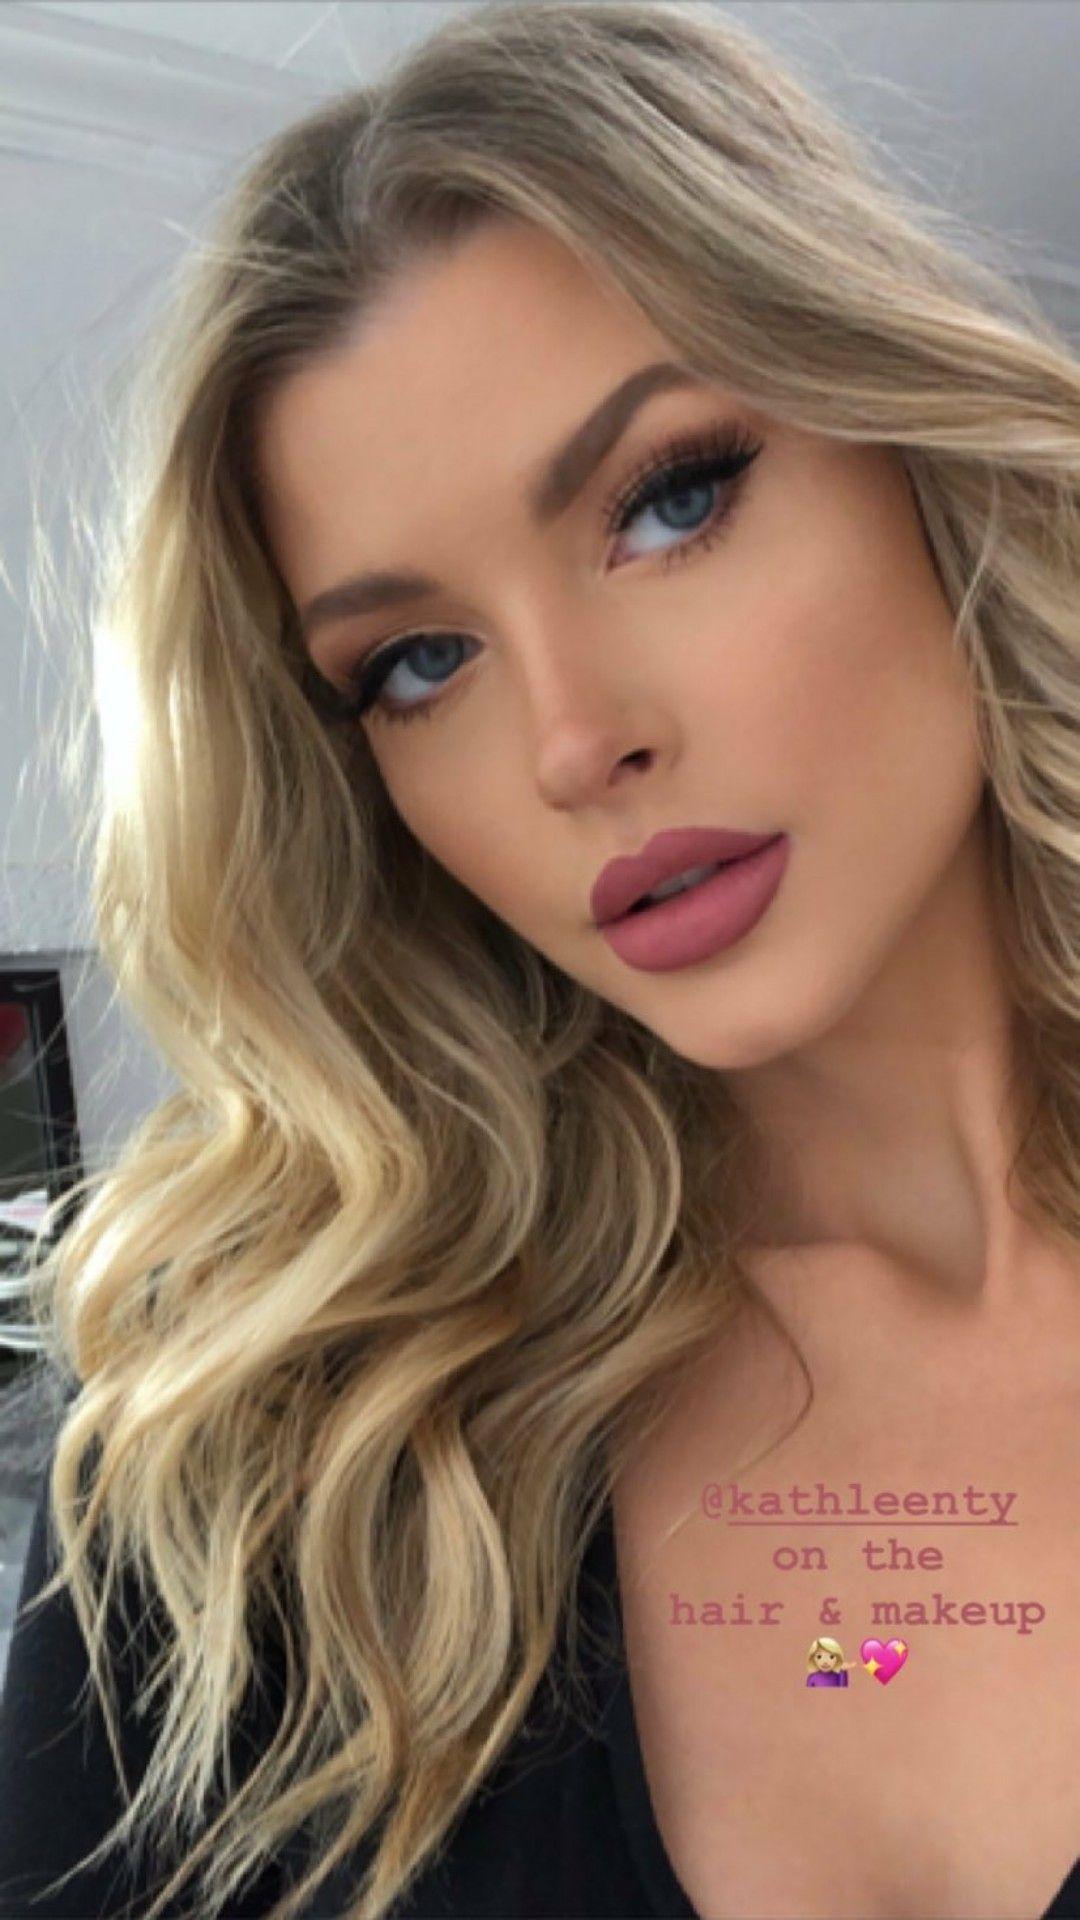 Selfie Erin Cummins nude (27 photo), Sexy, Cleavage, Boobs, swimsuit 2019